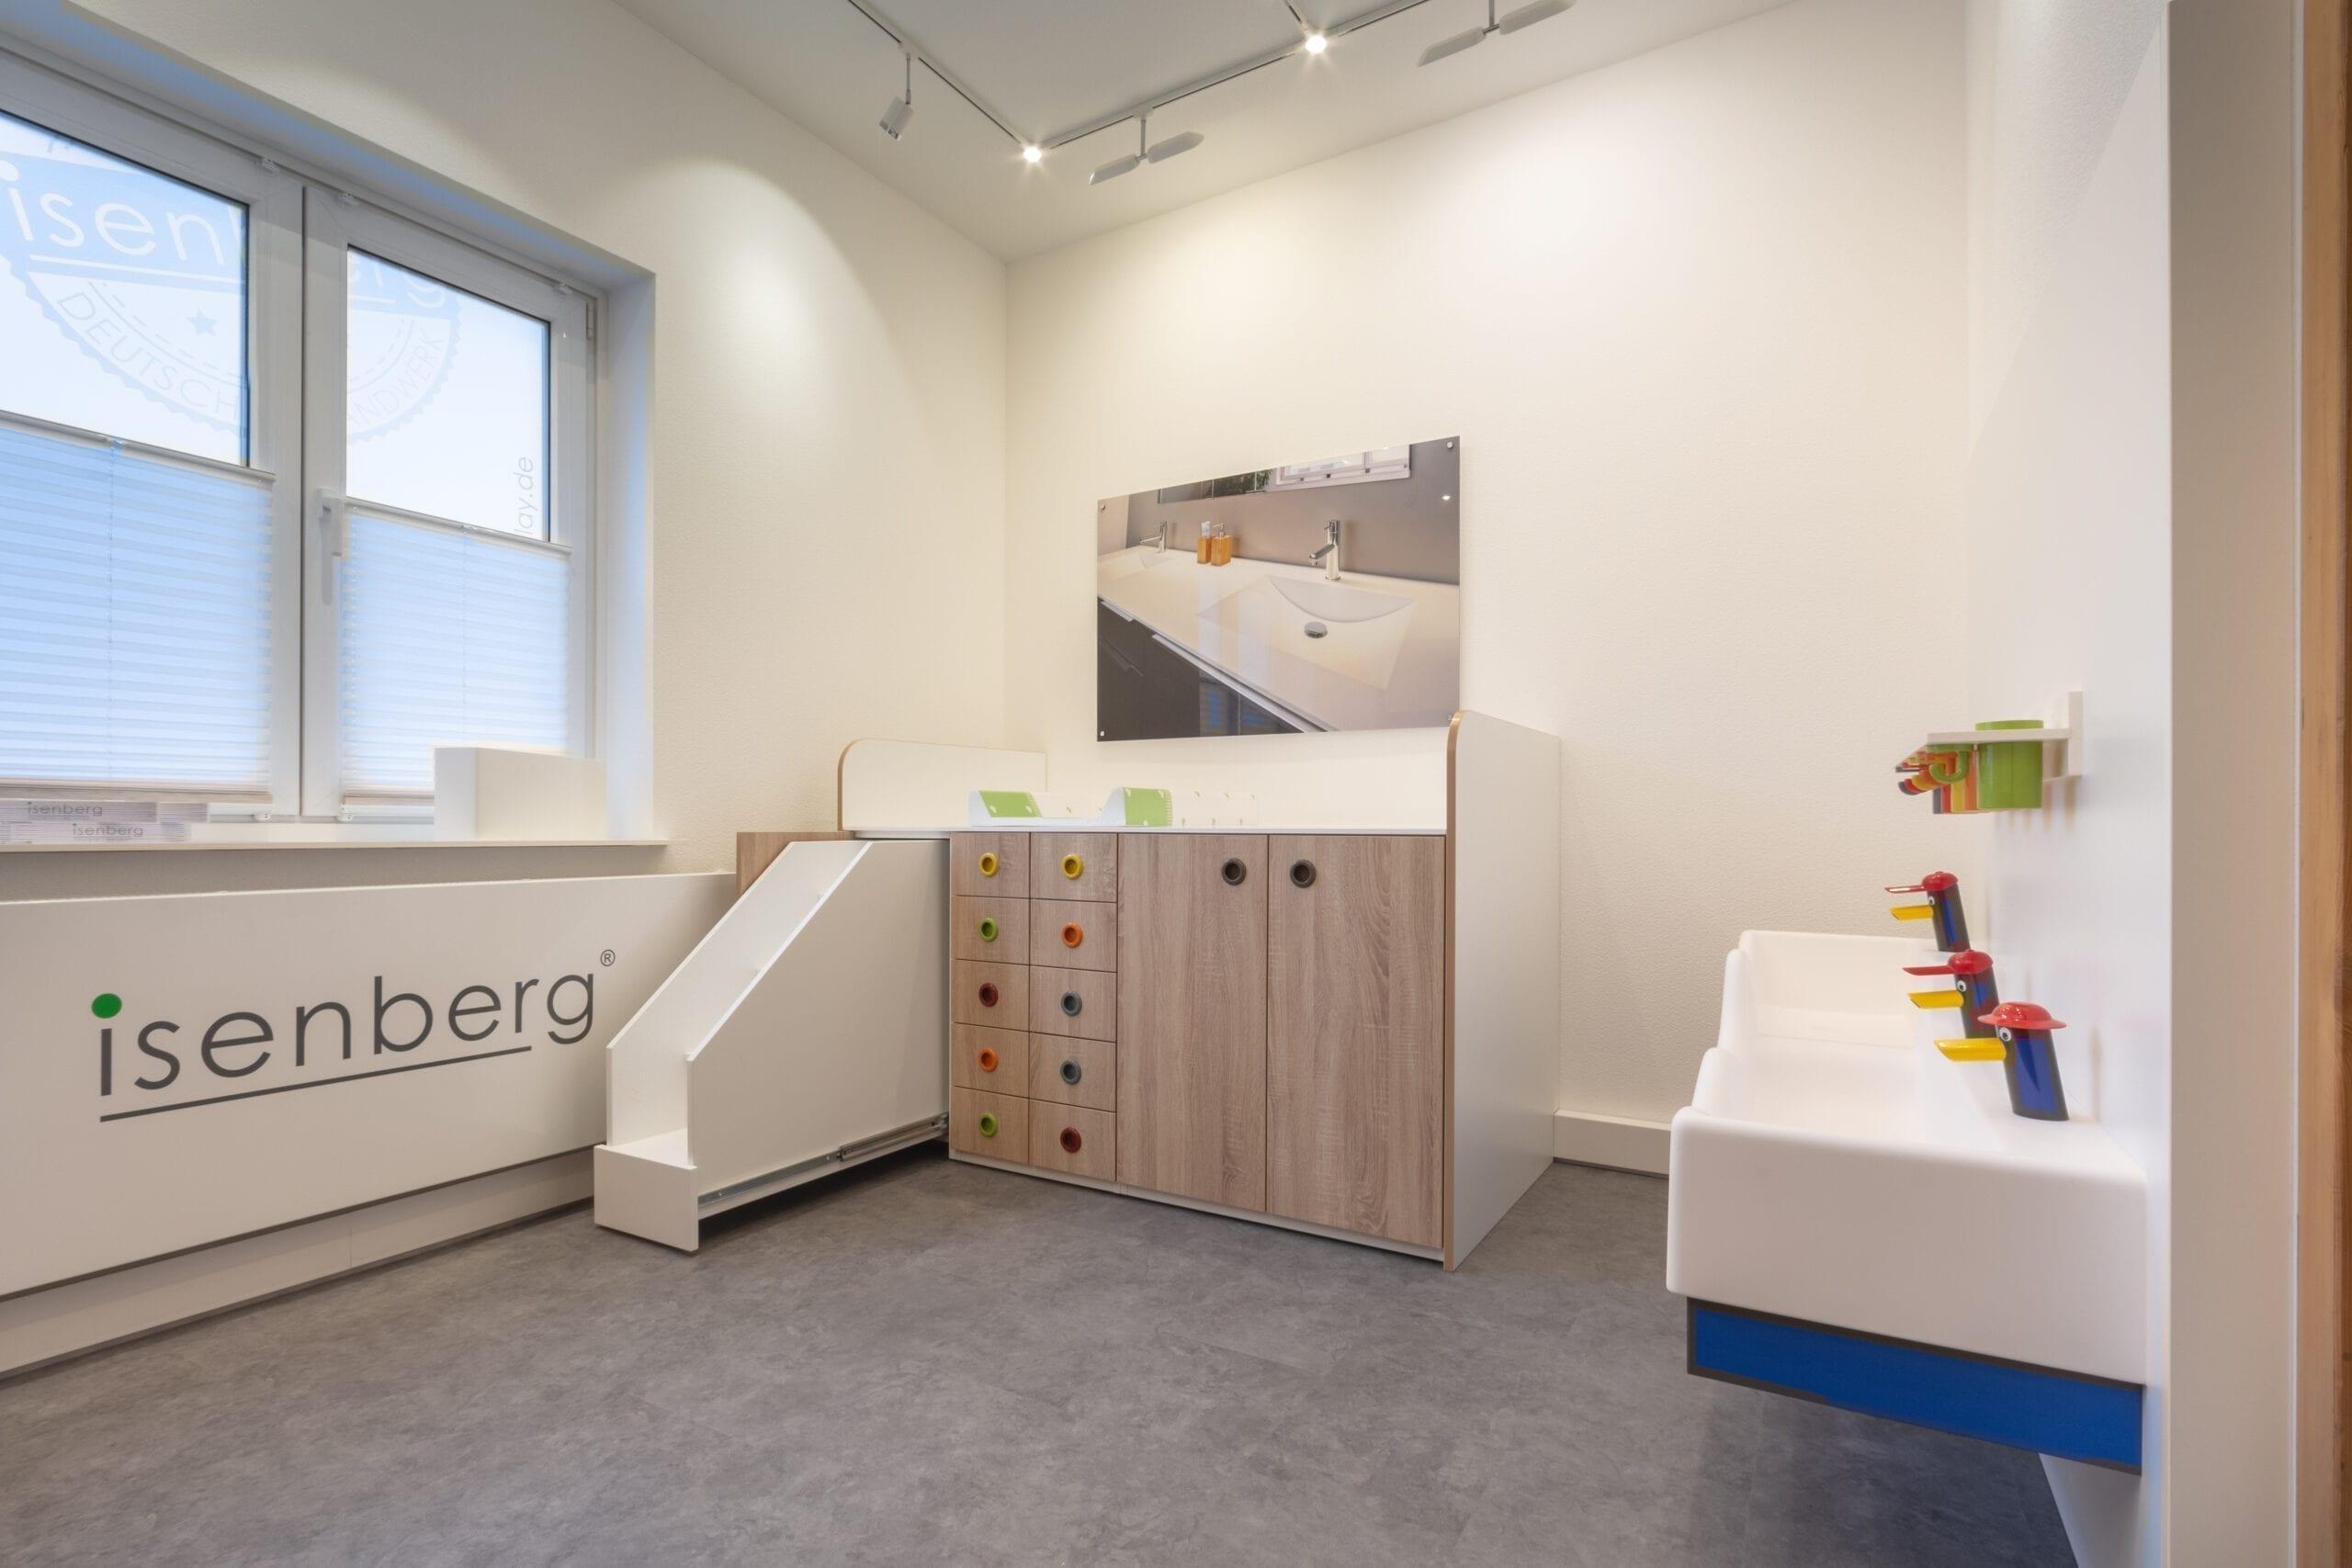 isenberg Kindergartenmöbel Ausstellung VARICOR